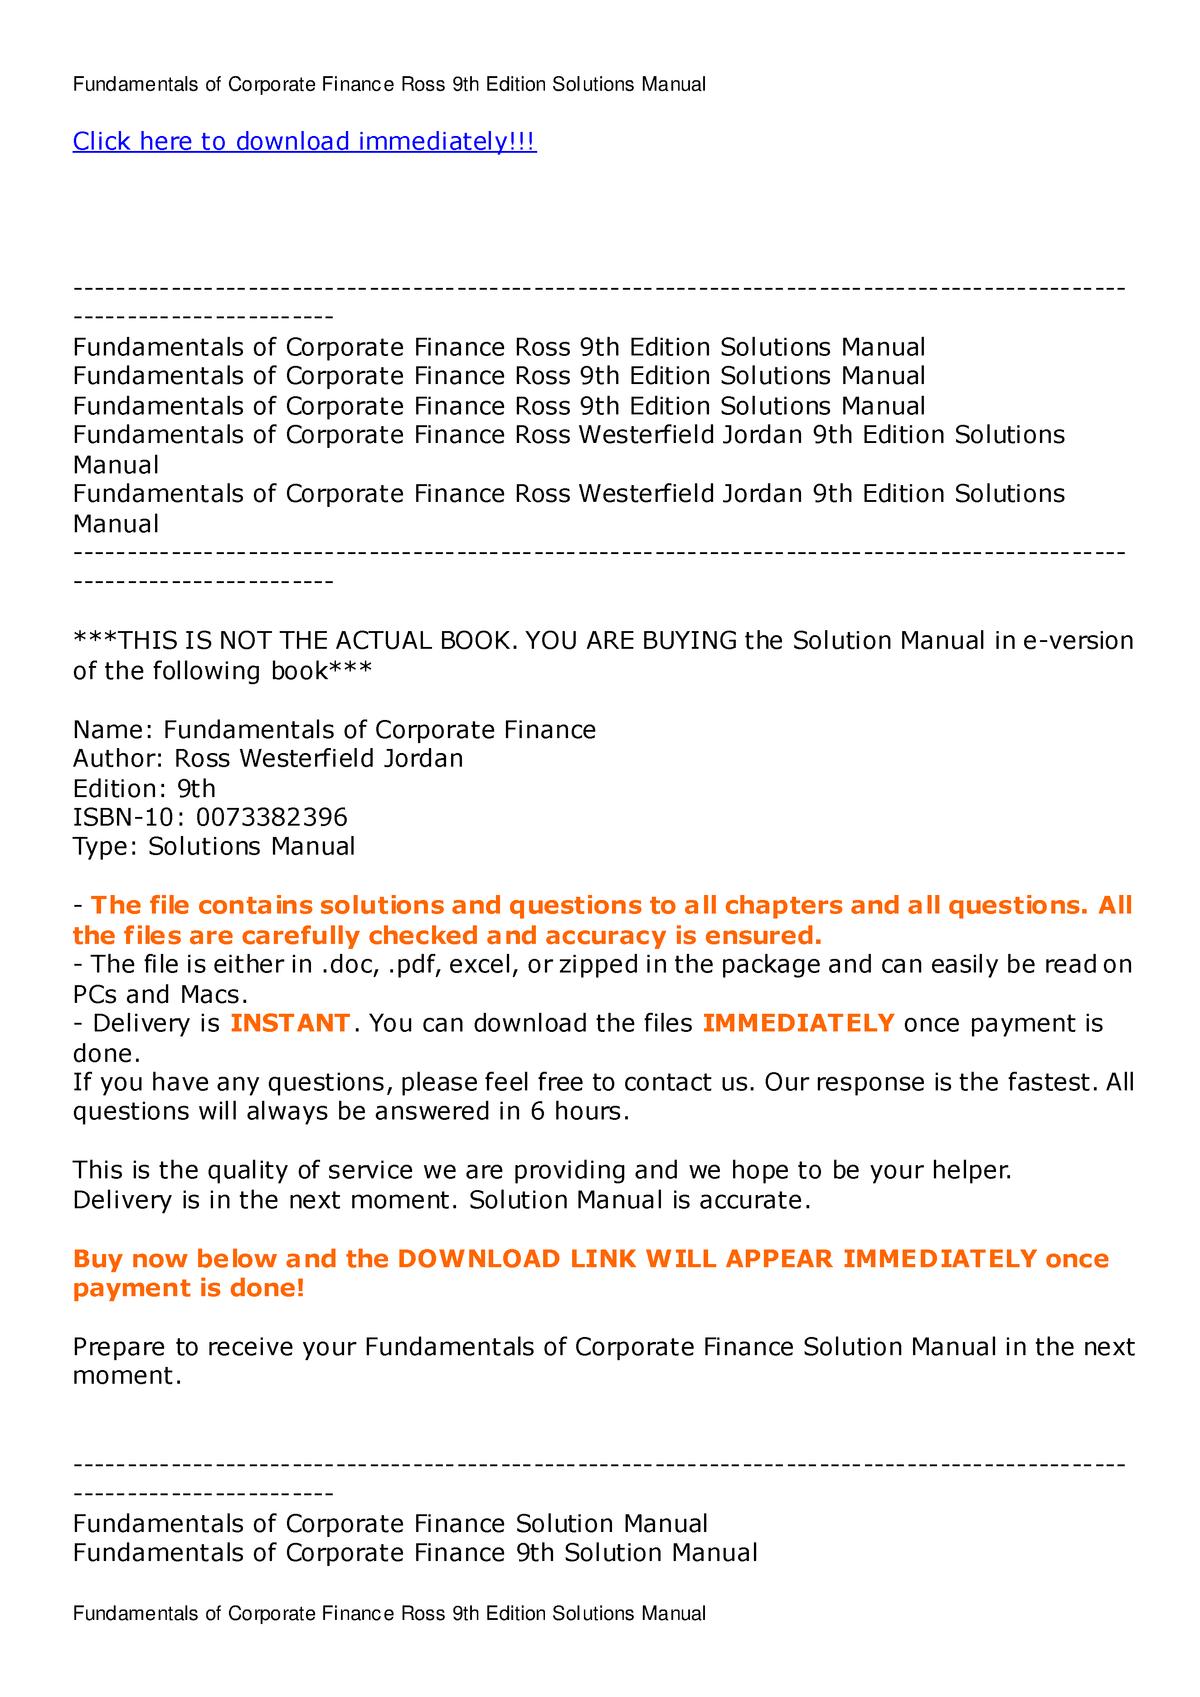 Fundamentals of Corporate Finance Ross 9 - cp3 - StuDocu